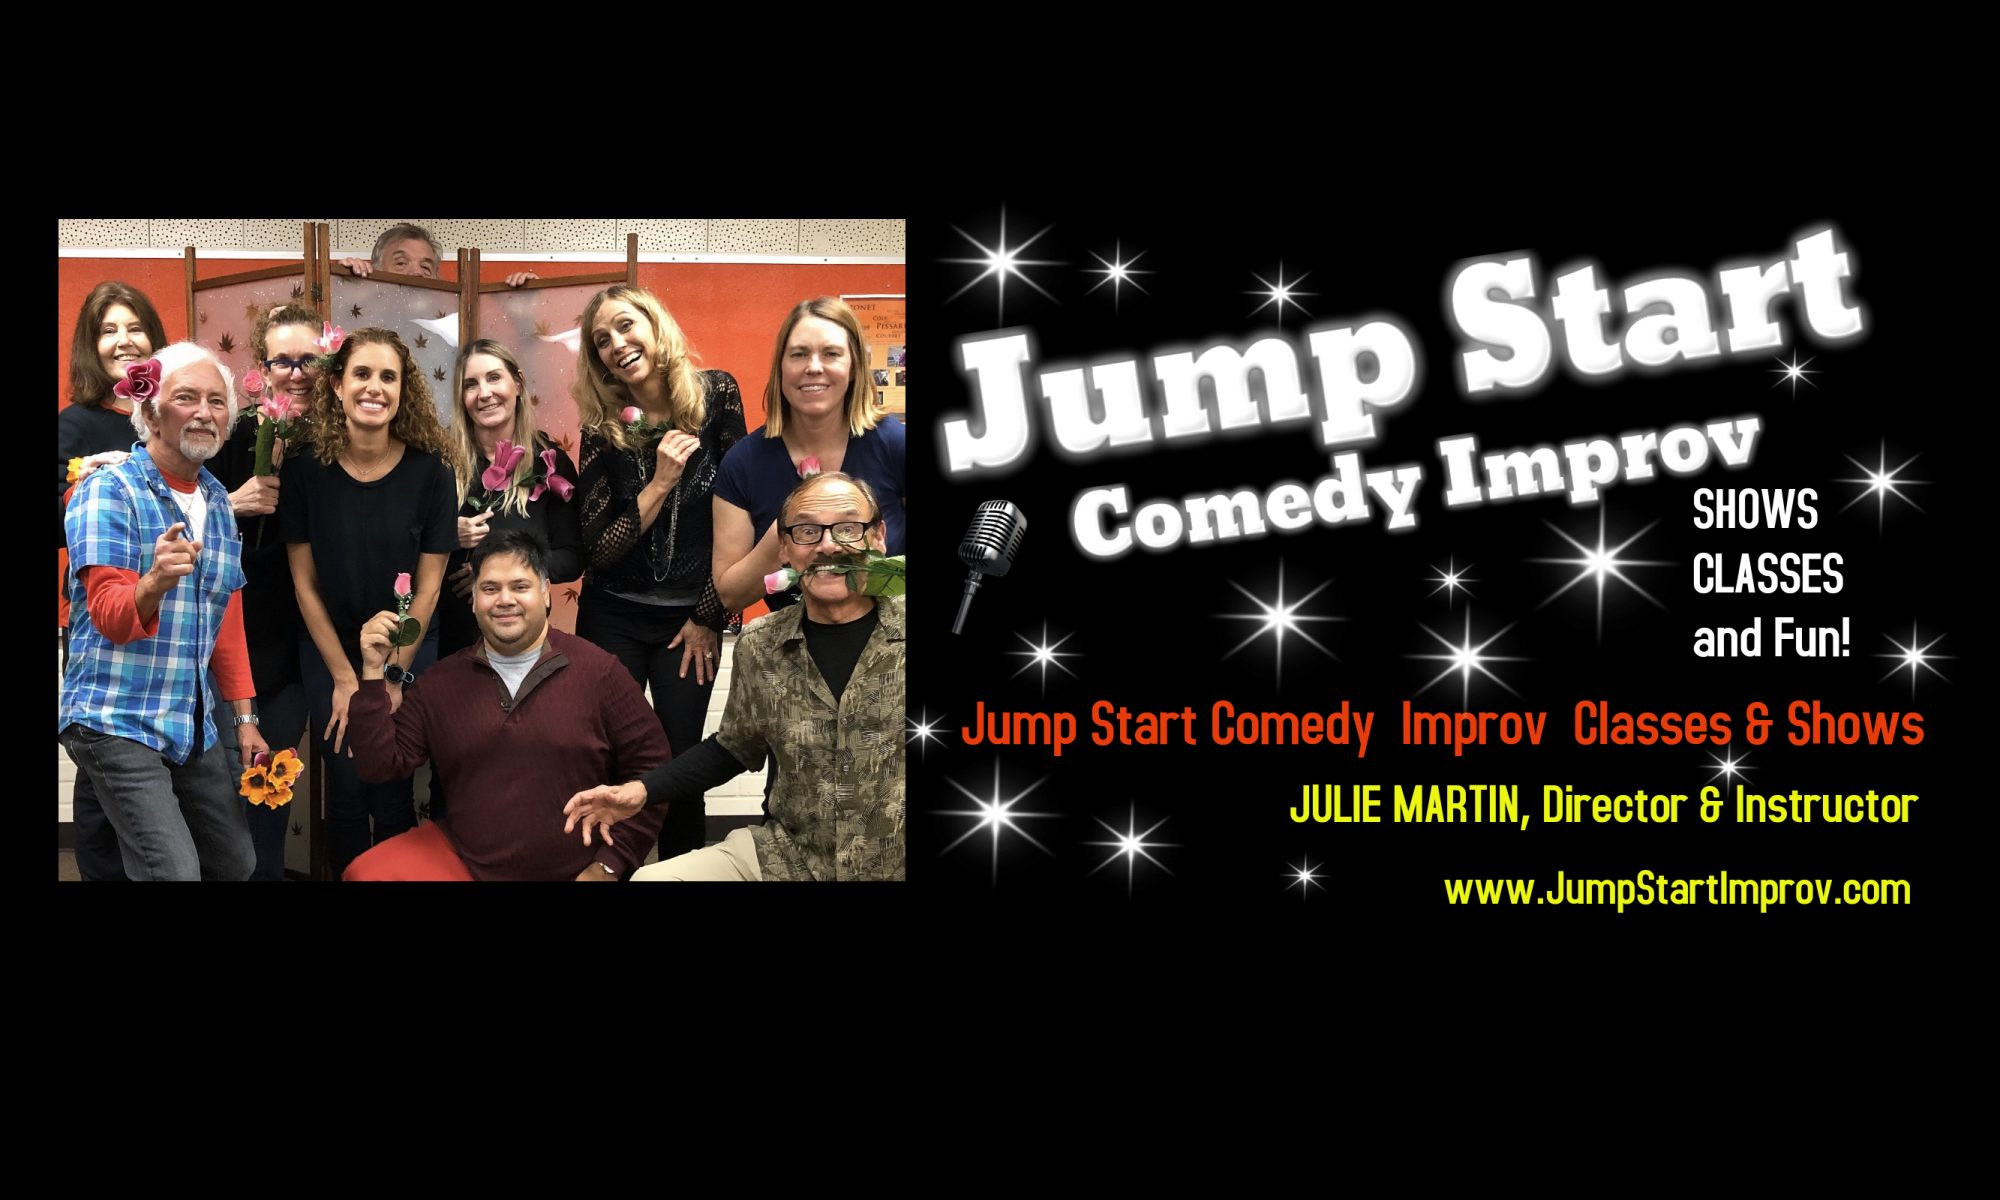 Jump Start Comedy Improv